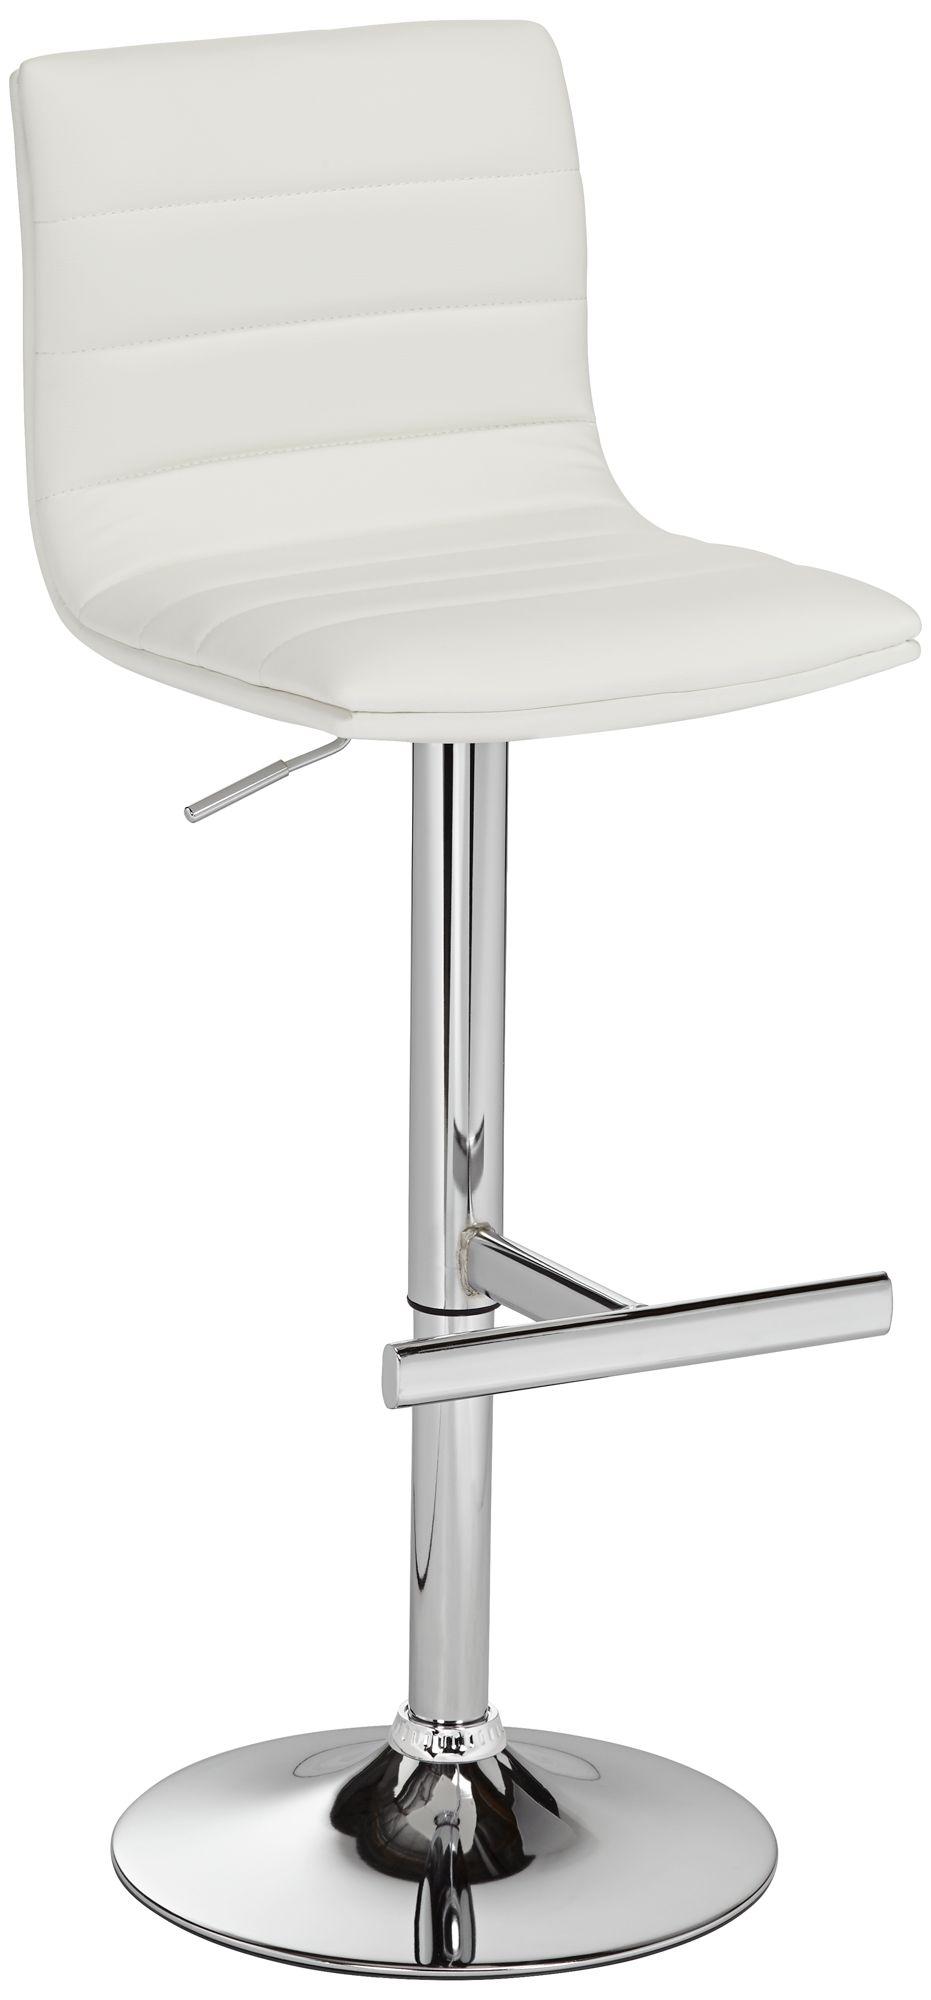 Motivo White Faux Leather Swivel Seat Adjustable Barstool